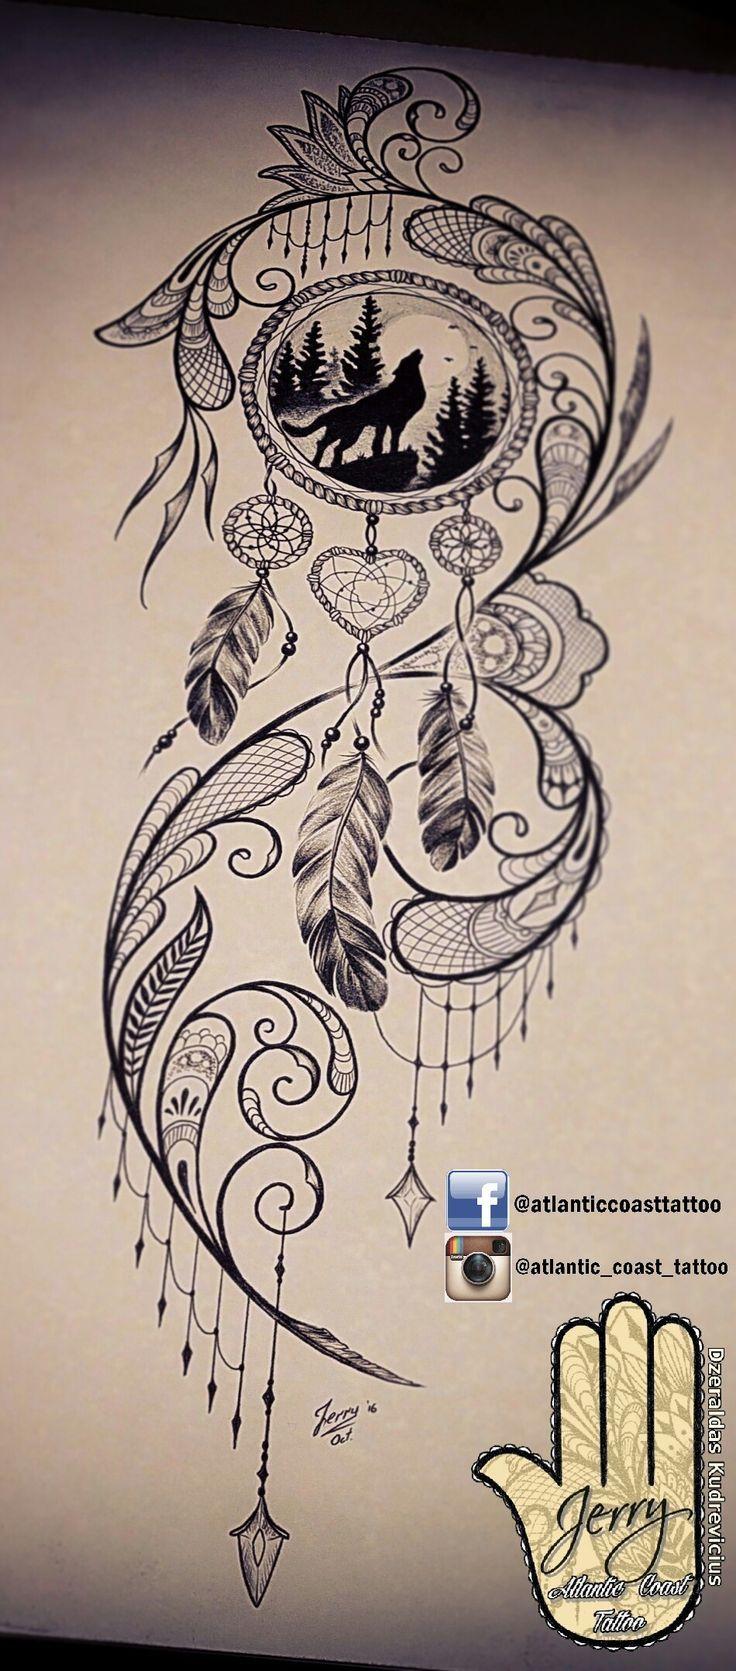 Beautiful tattoo idea design for a thigh, dream catcher tattoo, wolf tattoo idea…